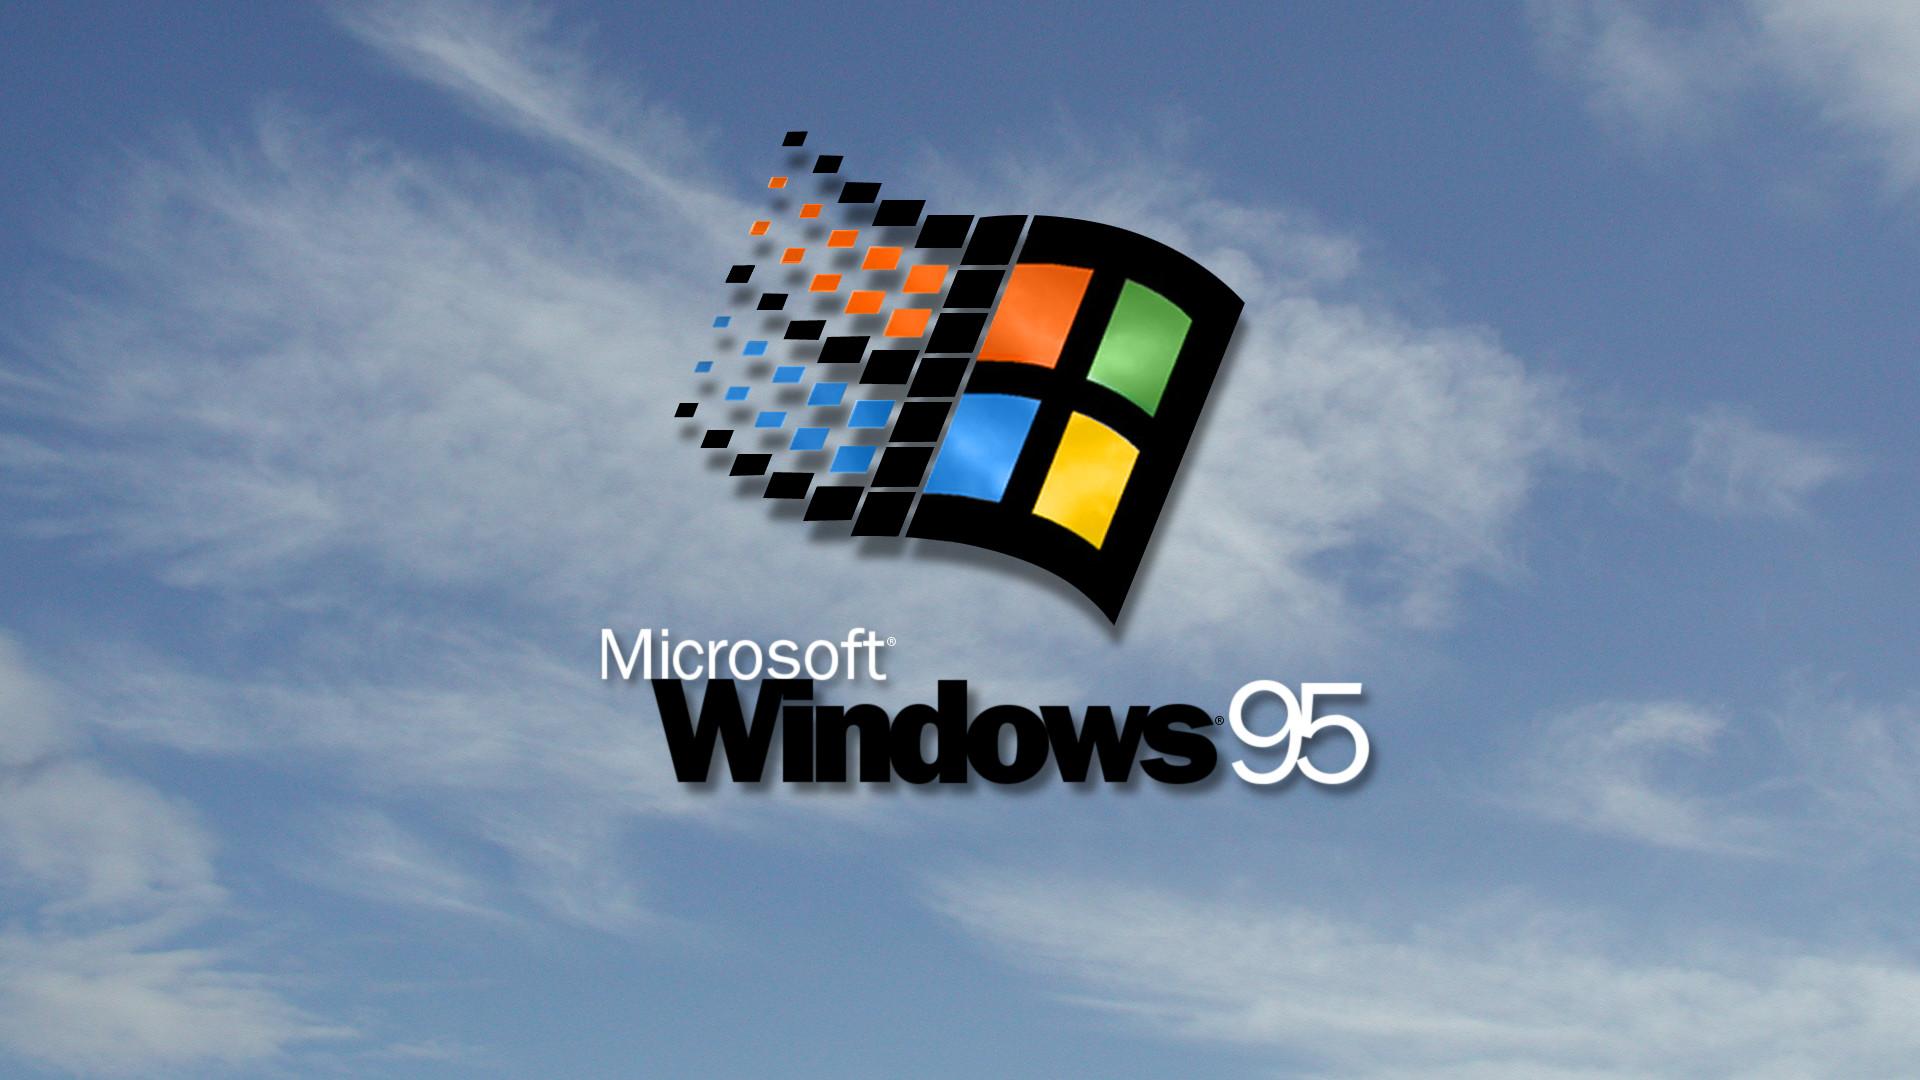 Image Windows 95 inspired wallpaper